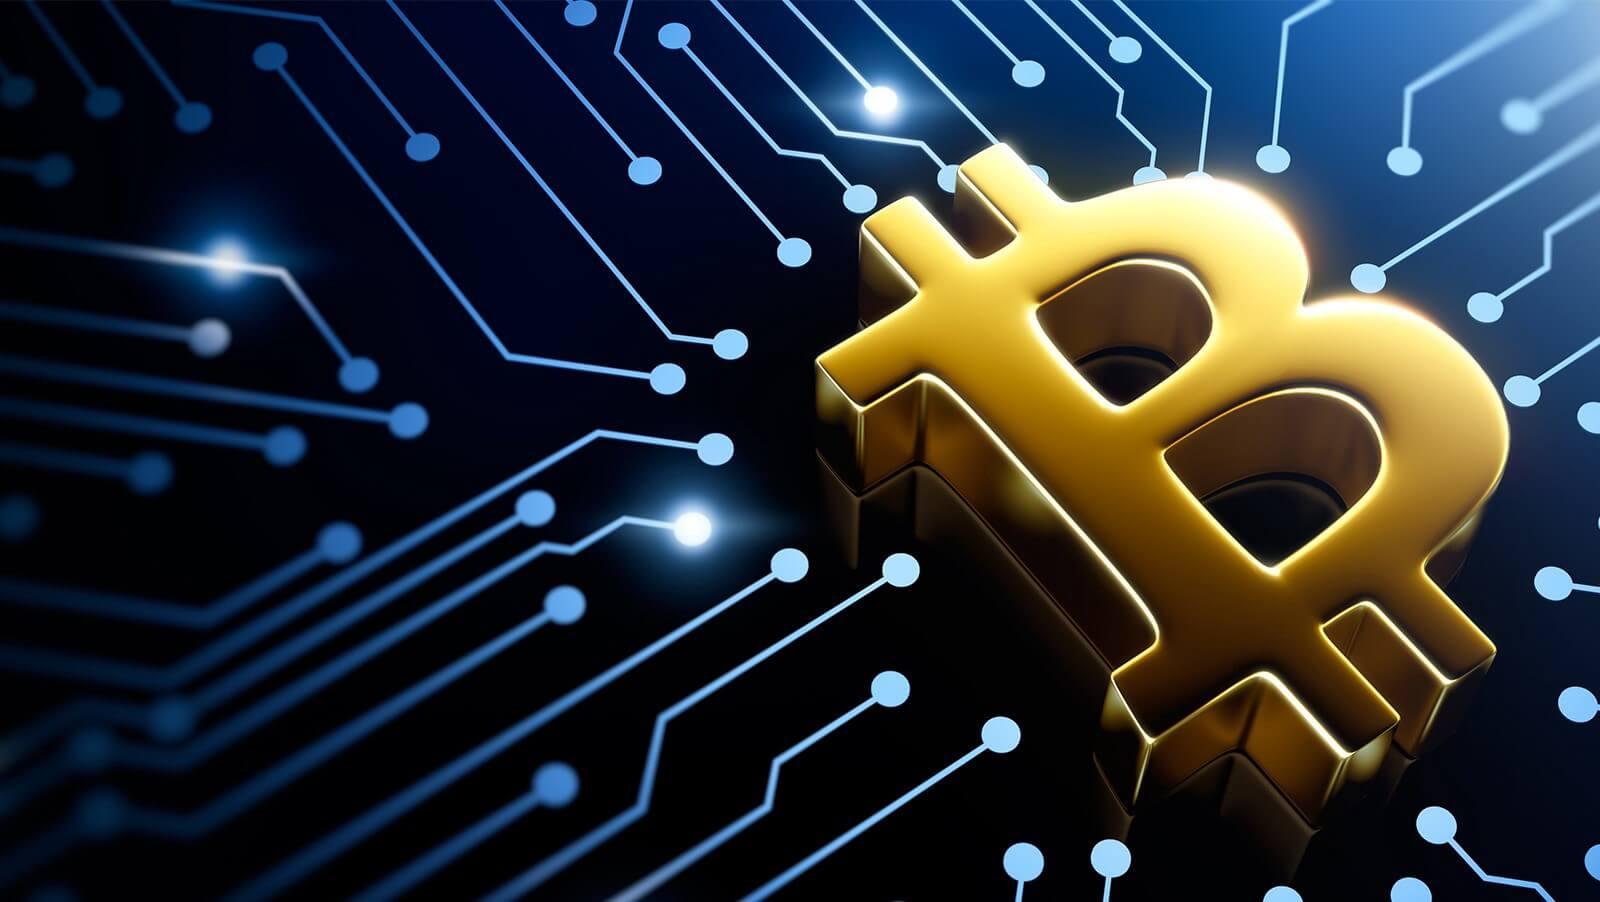 Bitcoin как заработать на майнинге биткоинов онлайн работа яндекс деньги